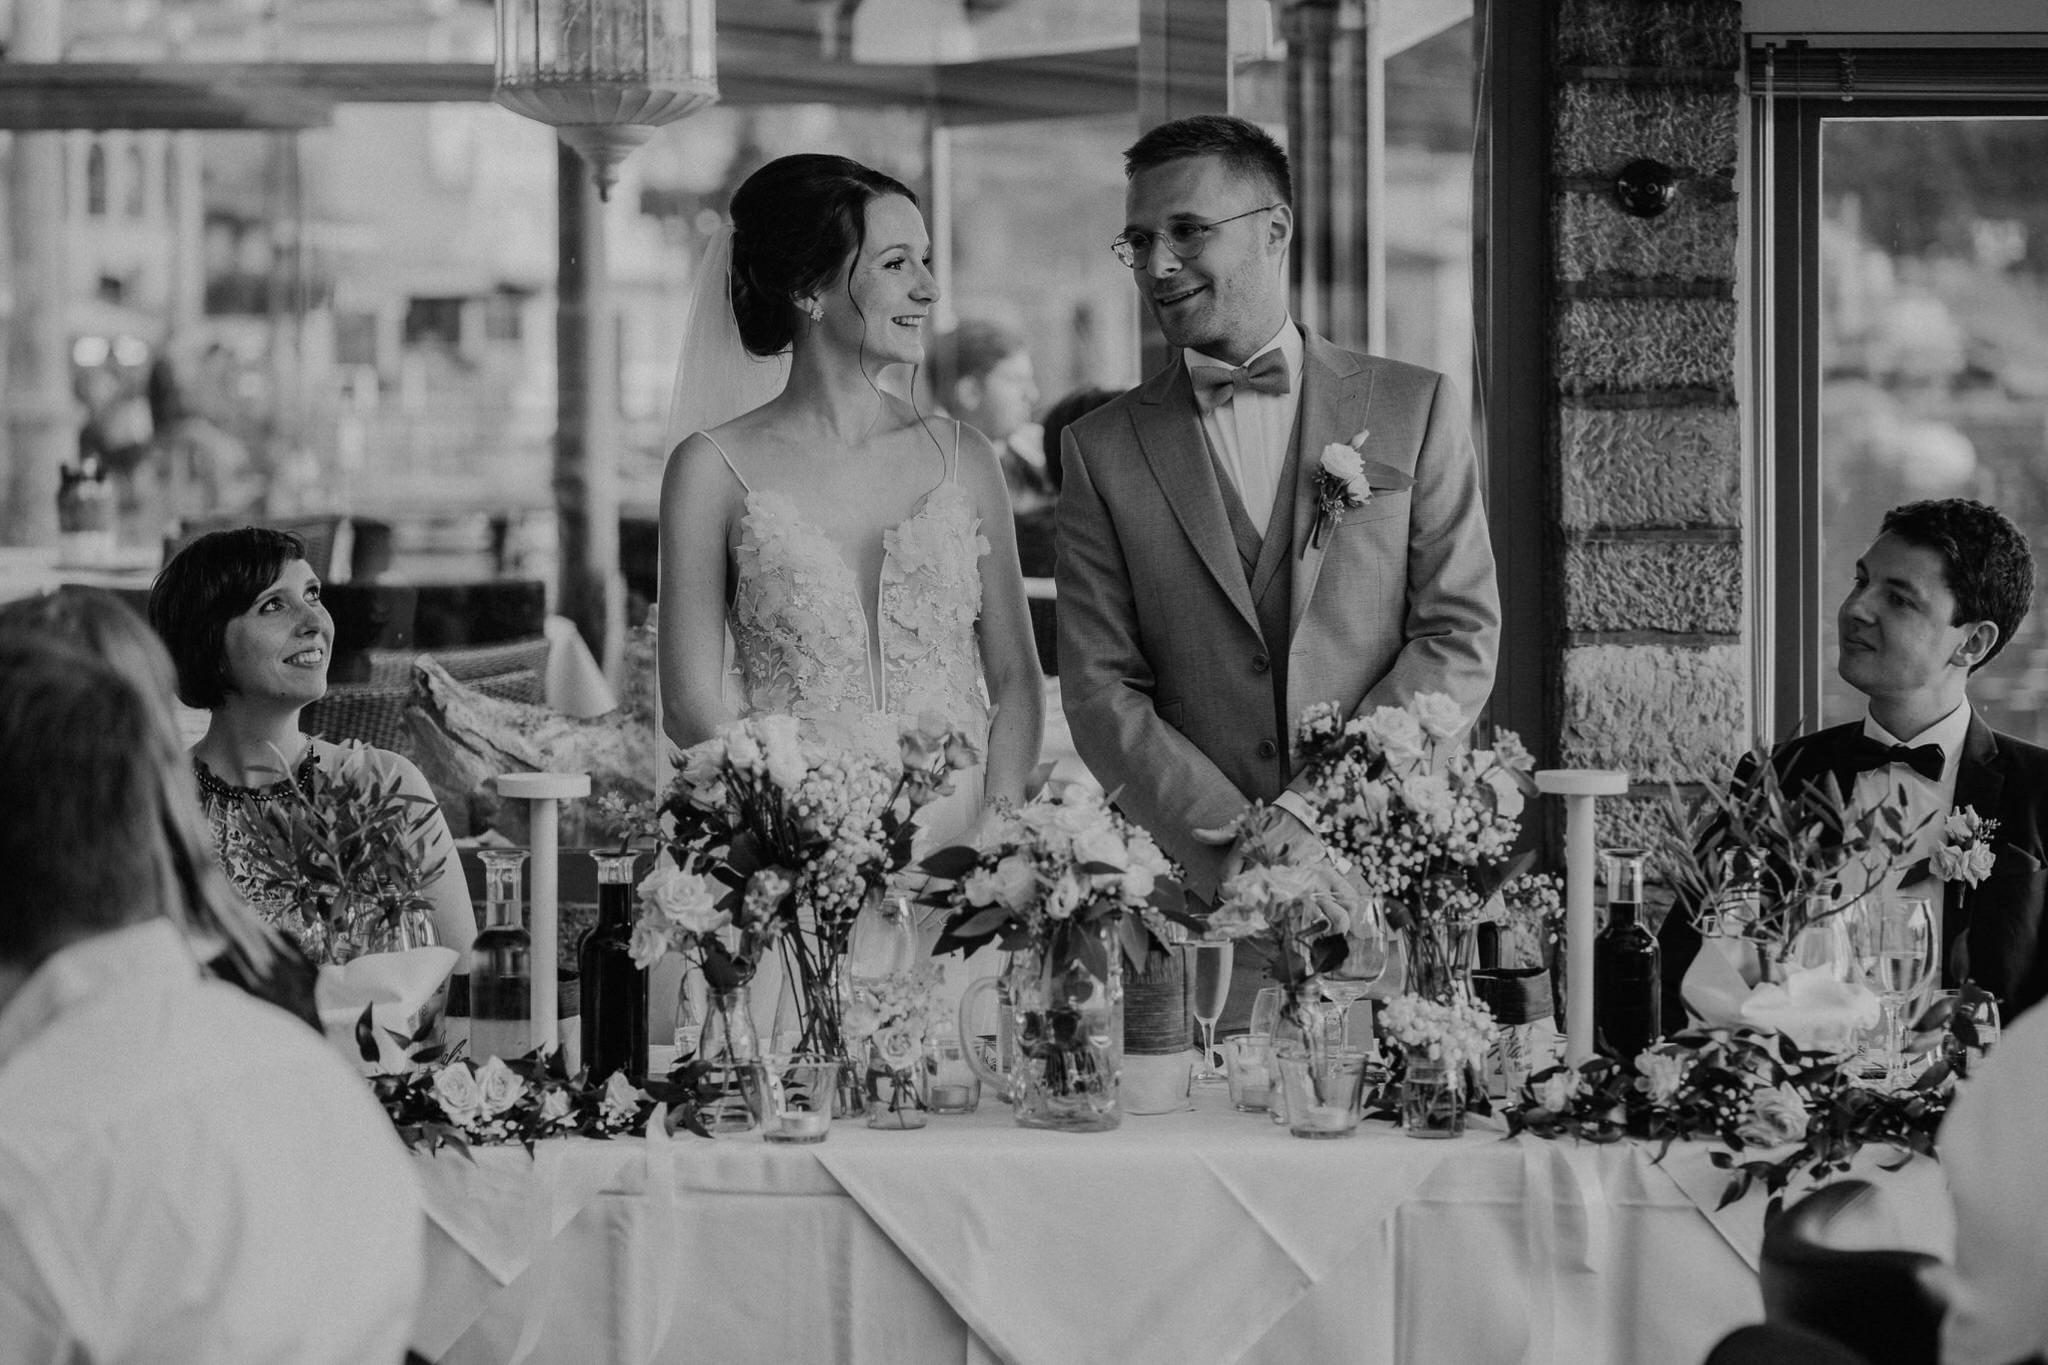 60 la 04 abend 1038 weddinphotographer Hochzeitsfotograf newzealand hamilton Weddingphotography Stuttgart